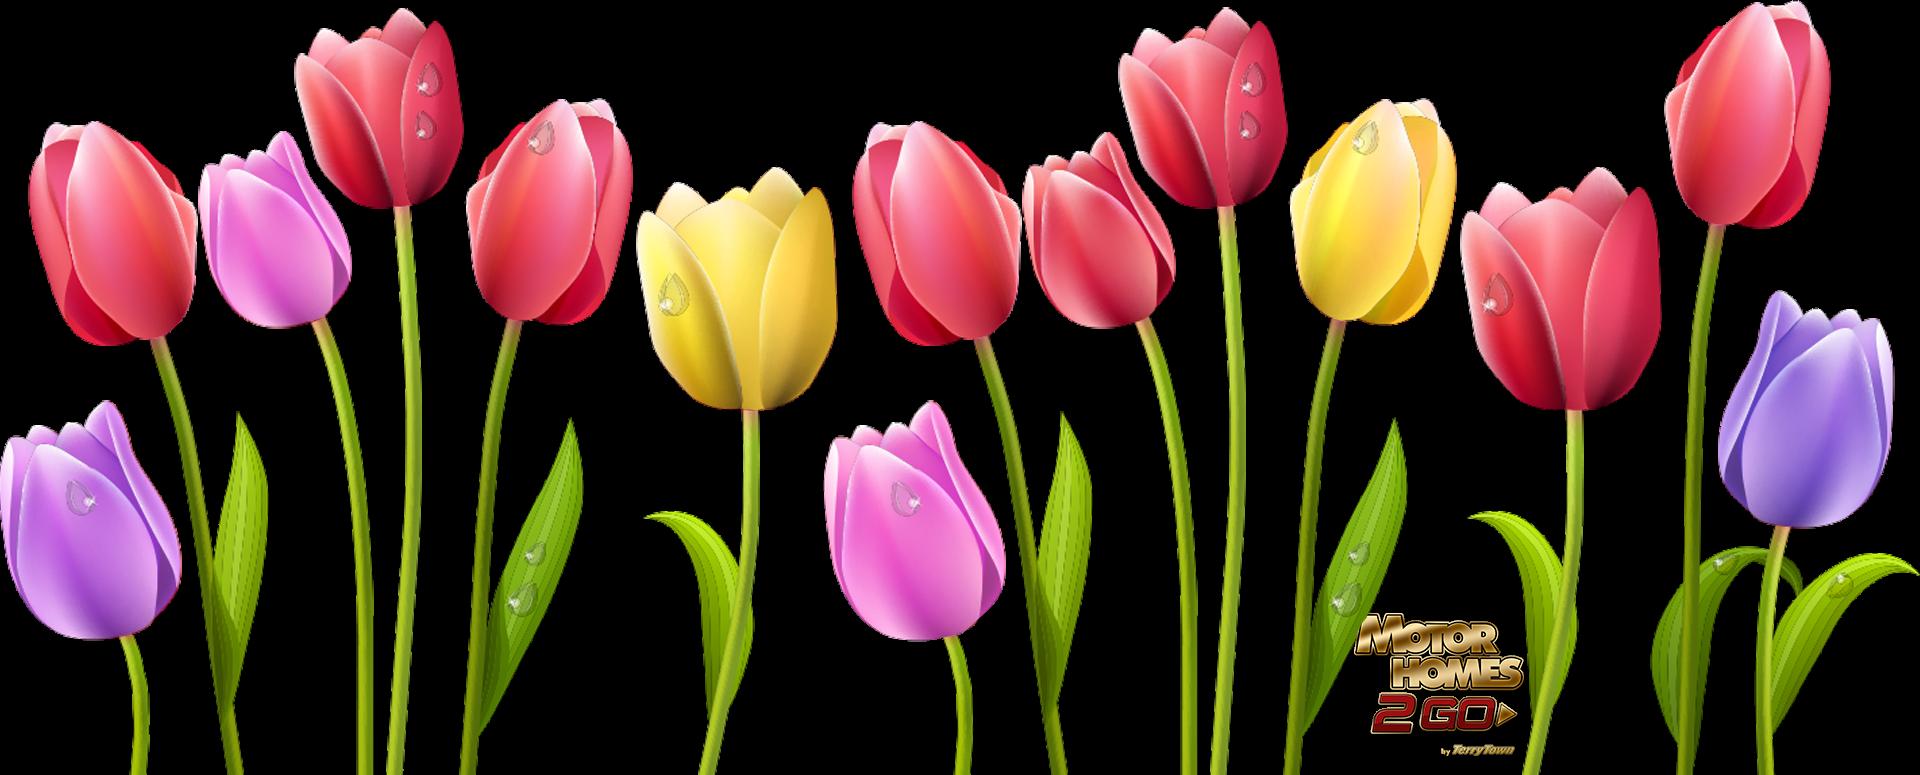 Clipart free tulip, Picture #526738 clipart free tulip.